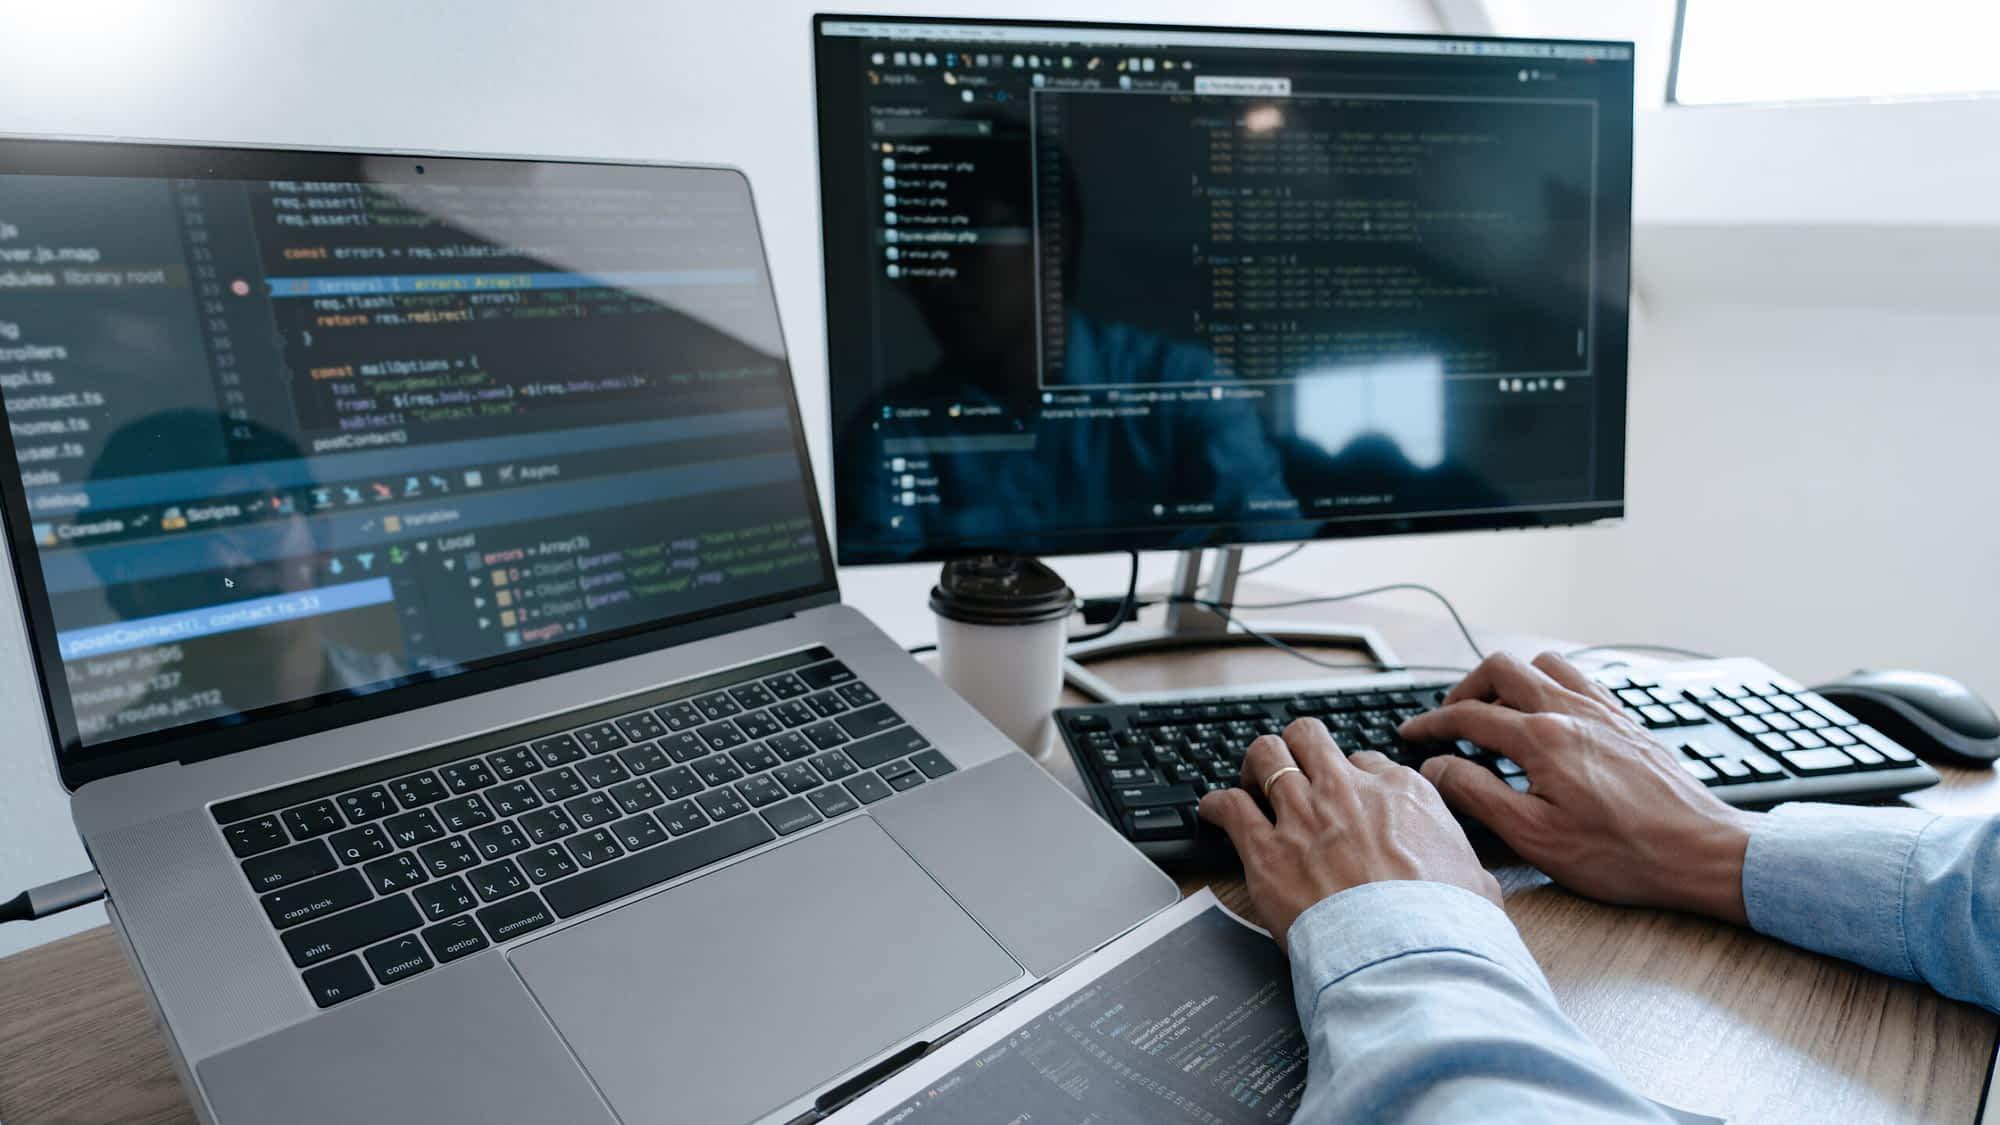 AWTech-home-sviluppo-applicazioni-cloud